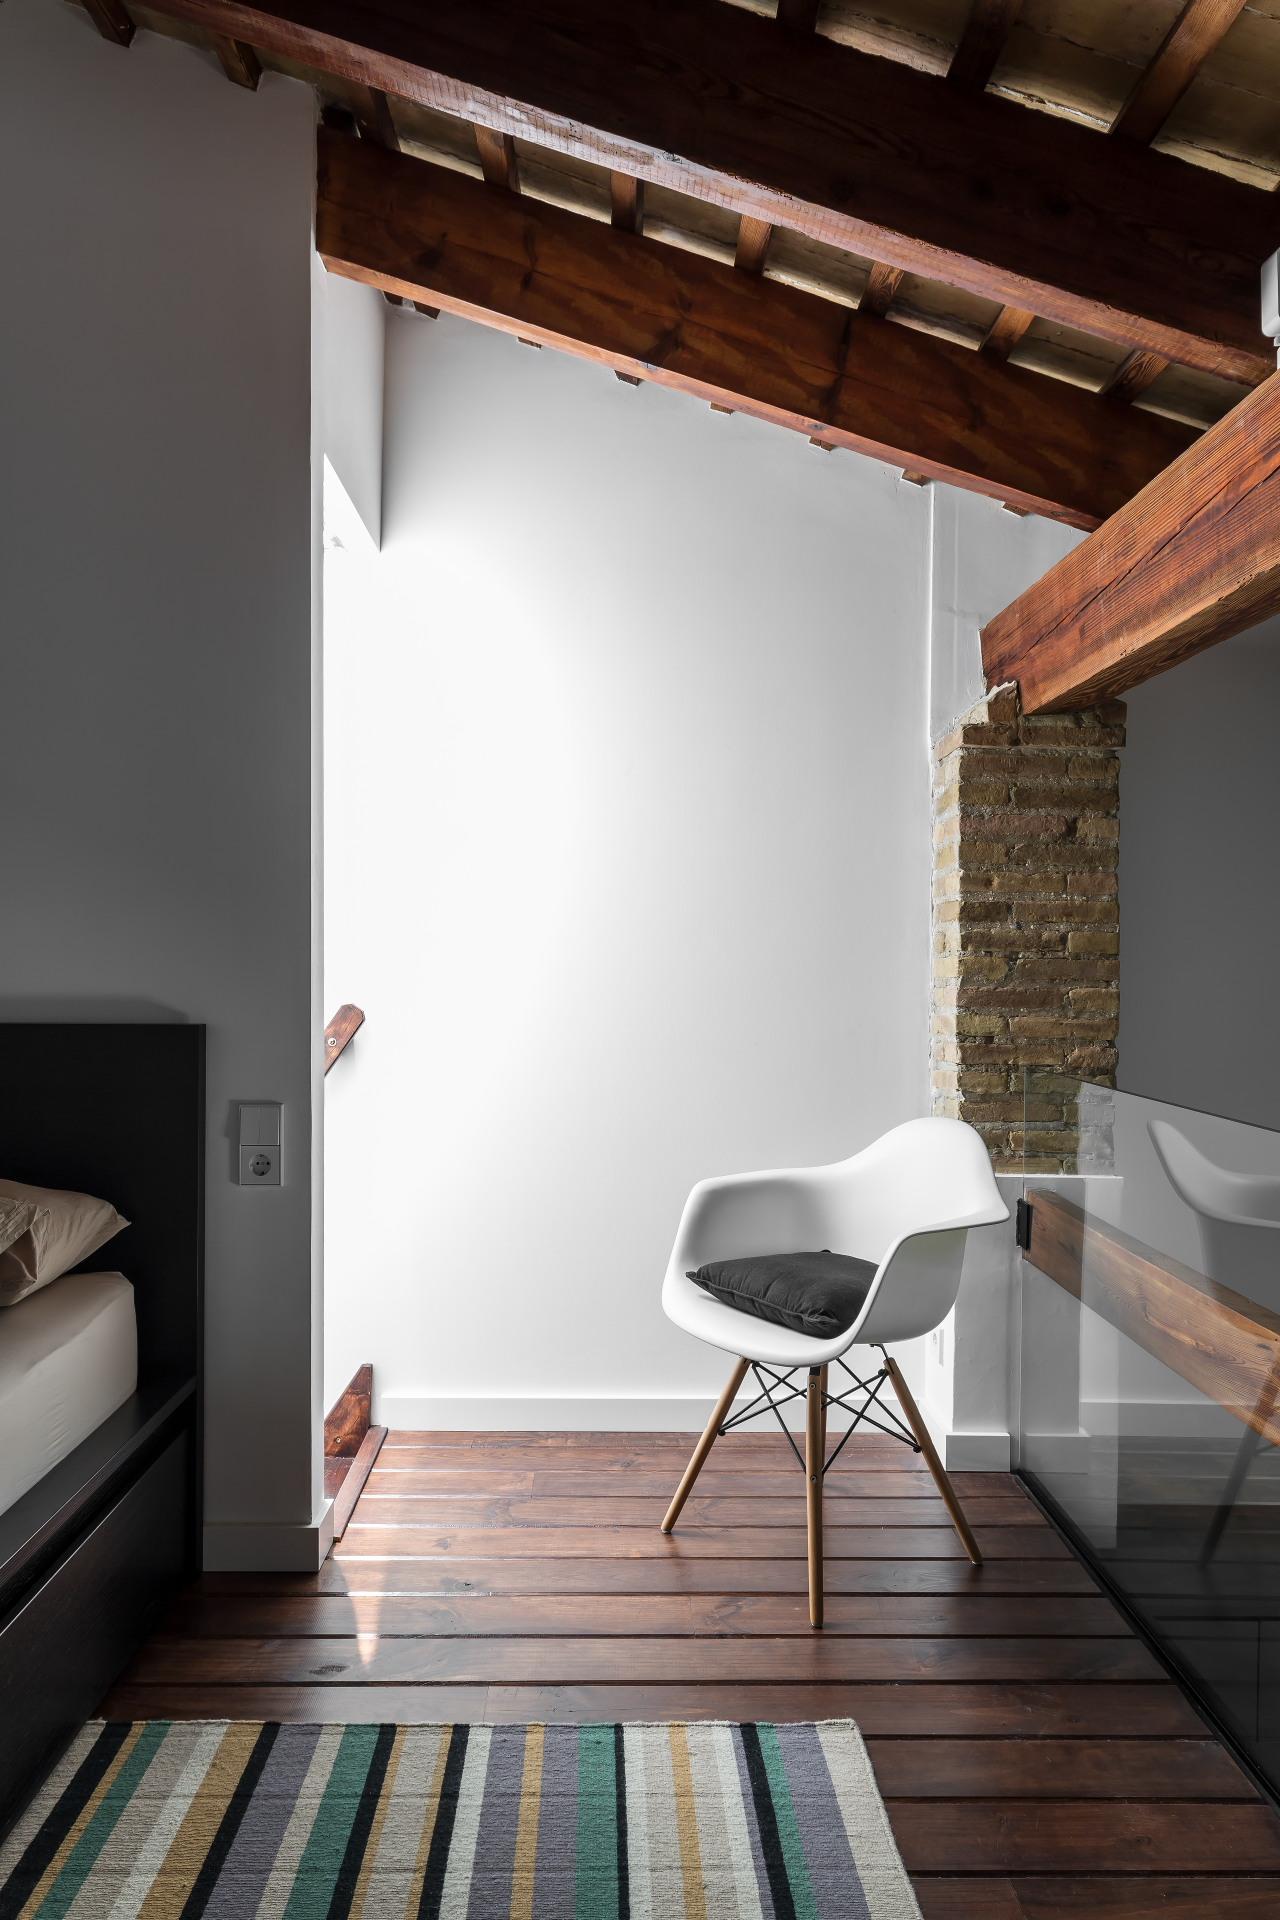 fotografia-arquitectura-valencia-german-cabo-ambau-cabanyal (20)